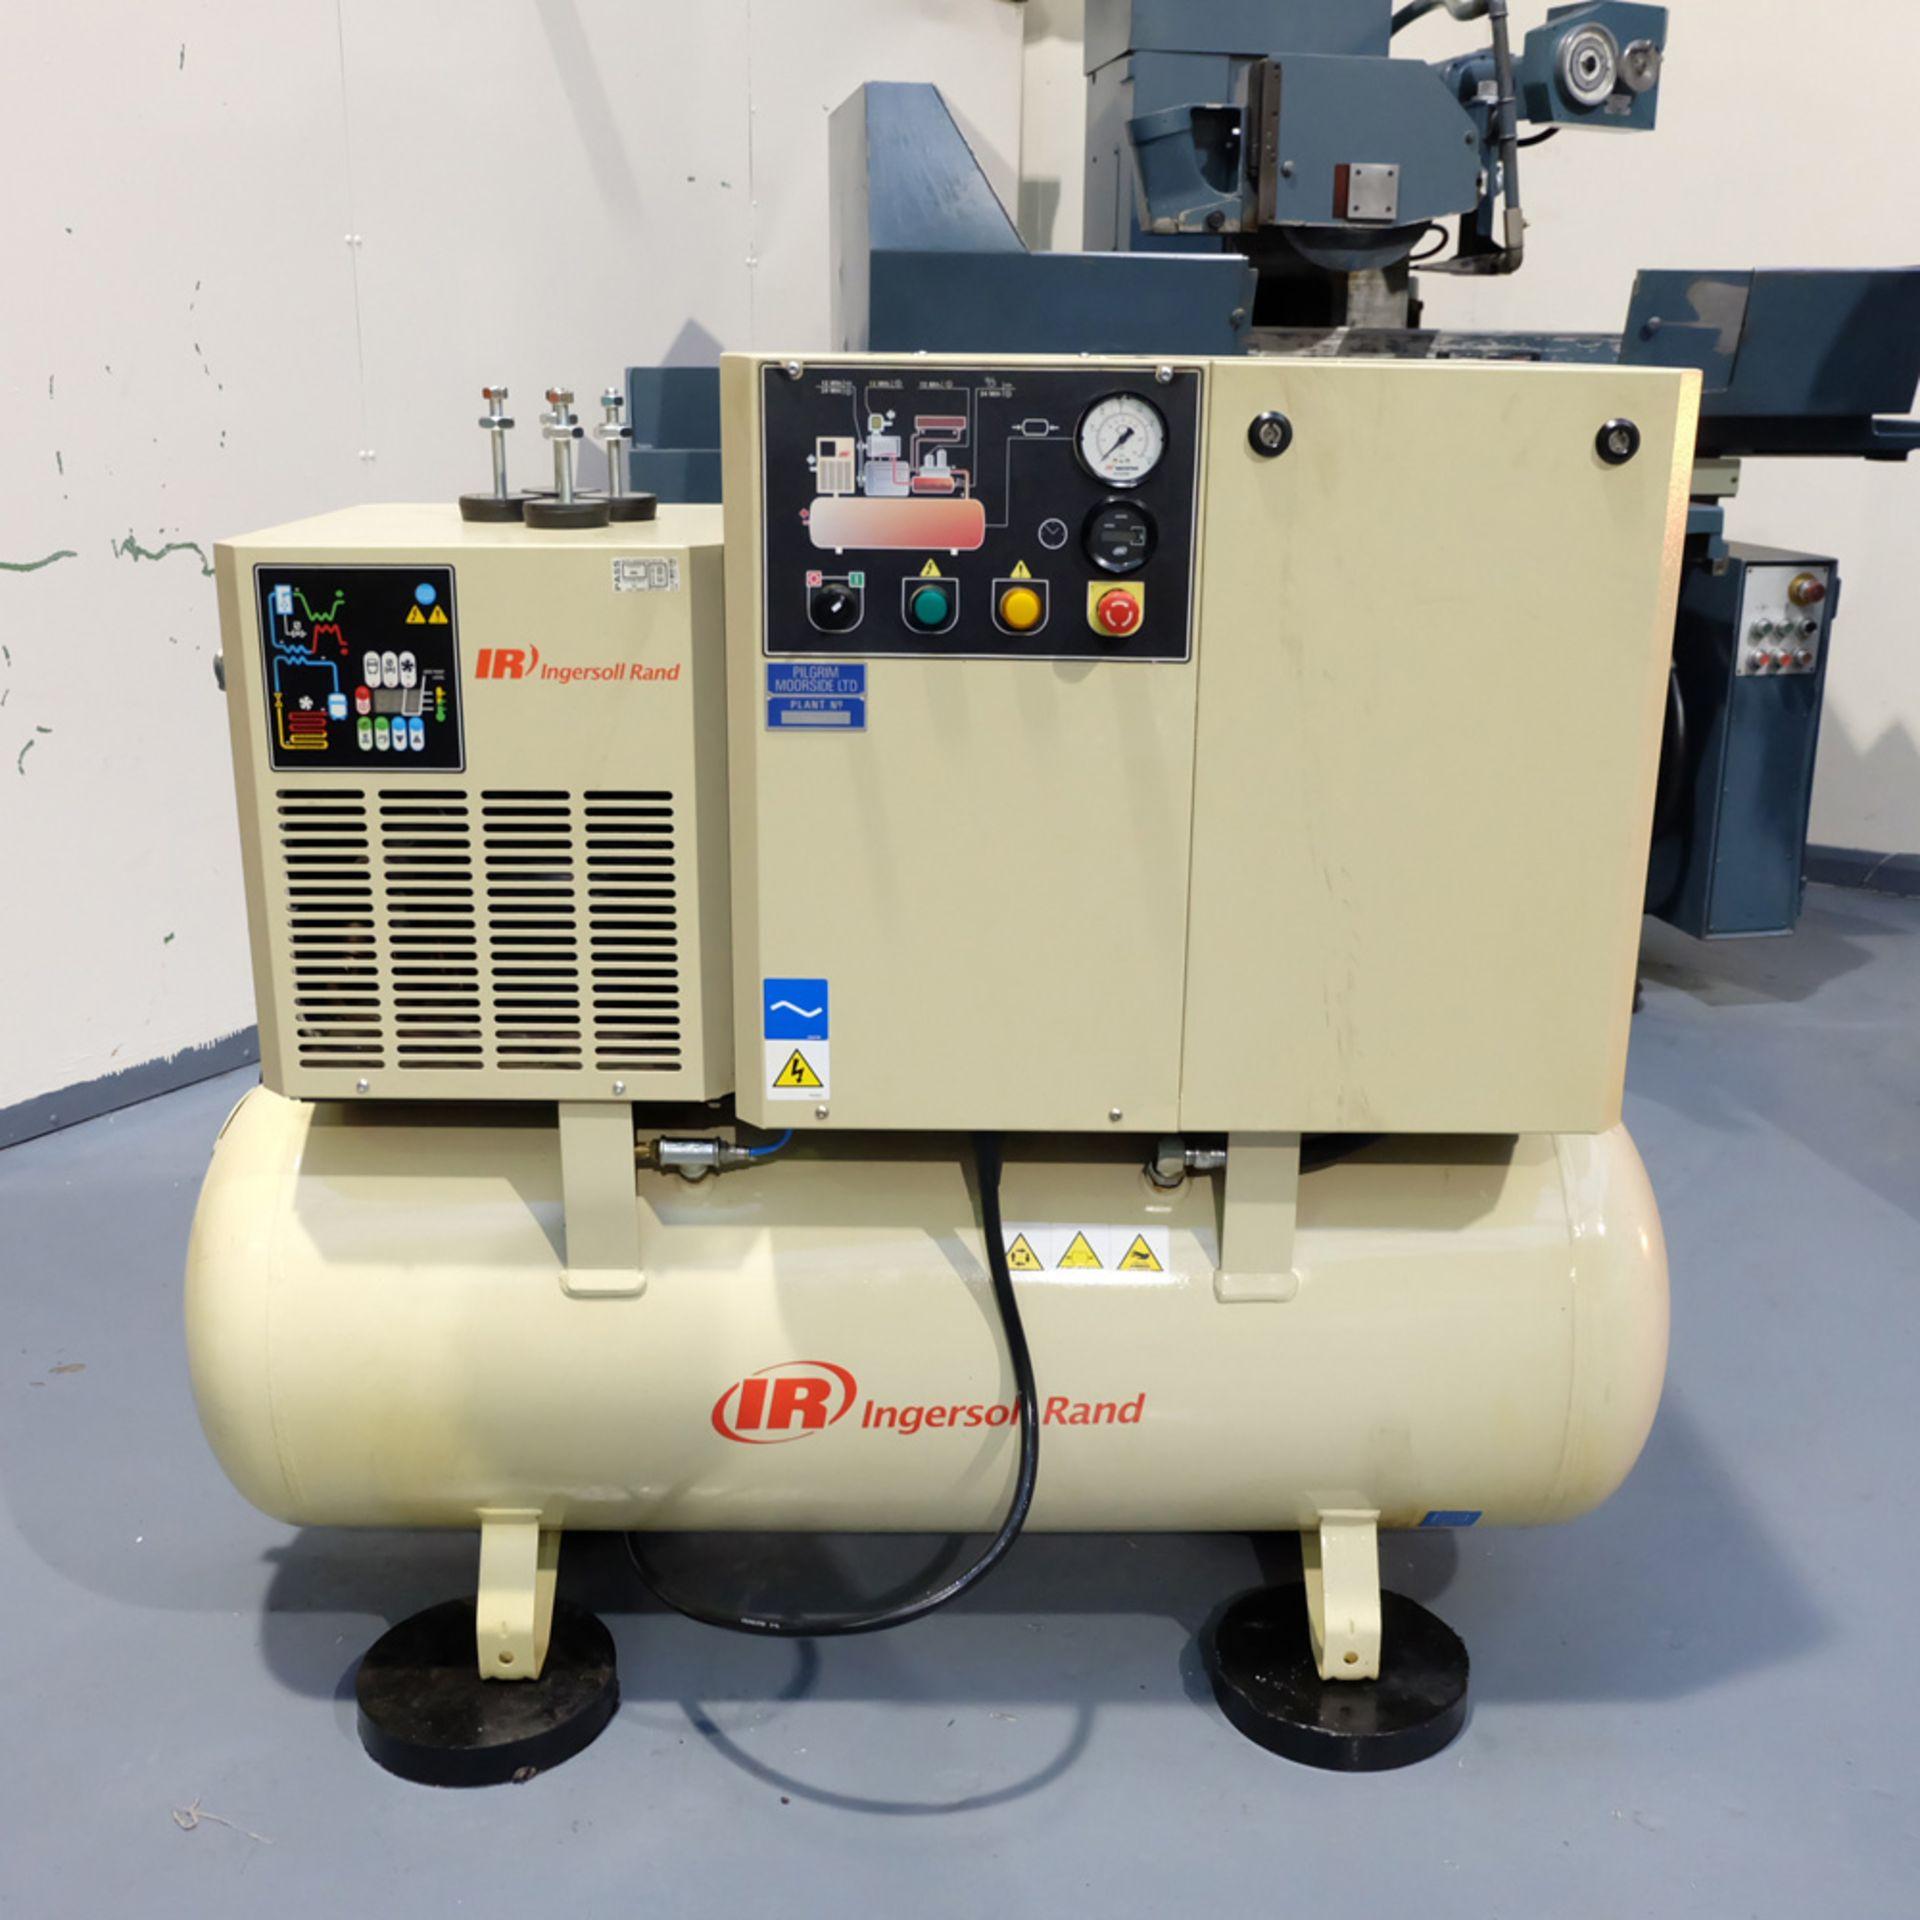 Ingersoll Rand Model R5.5IU D-SD Rotary Air Compressor. Working Pressure 10 Bar.